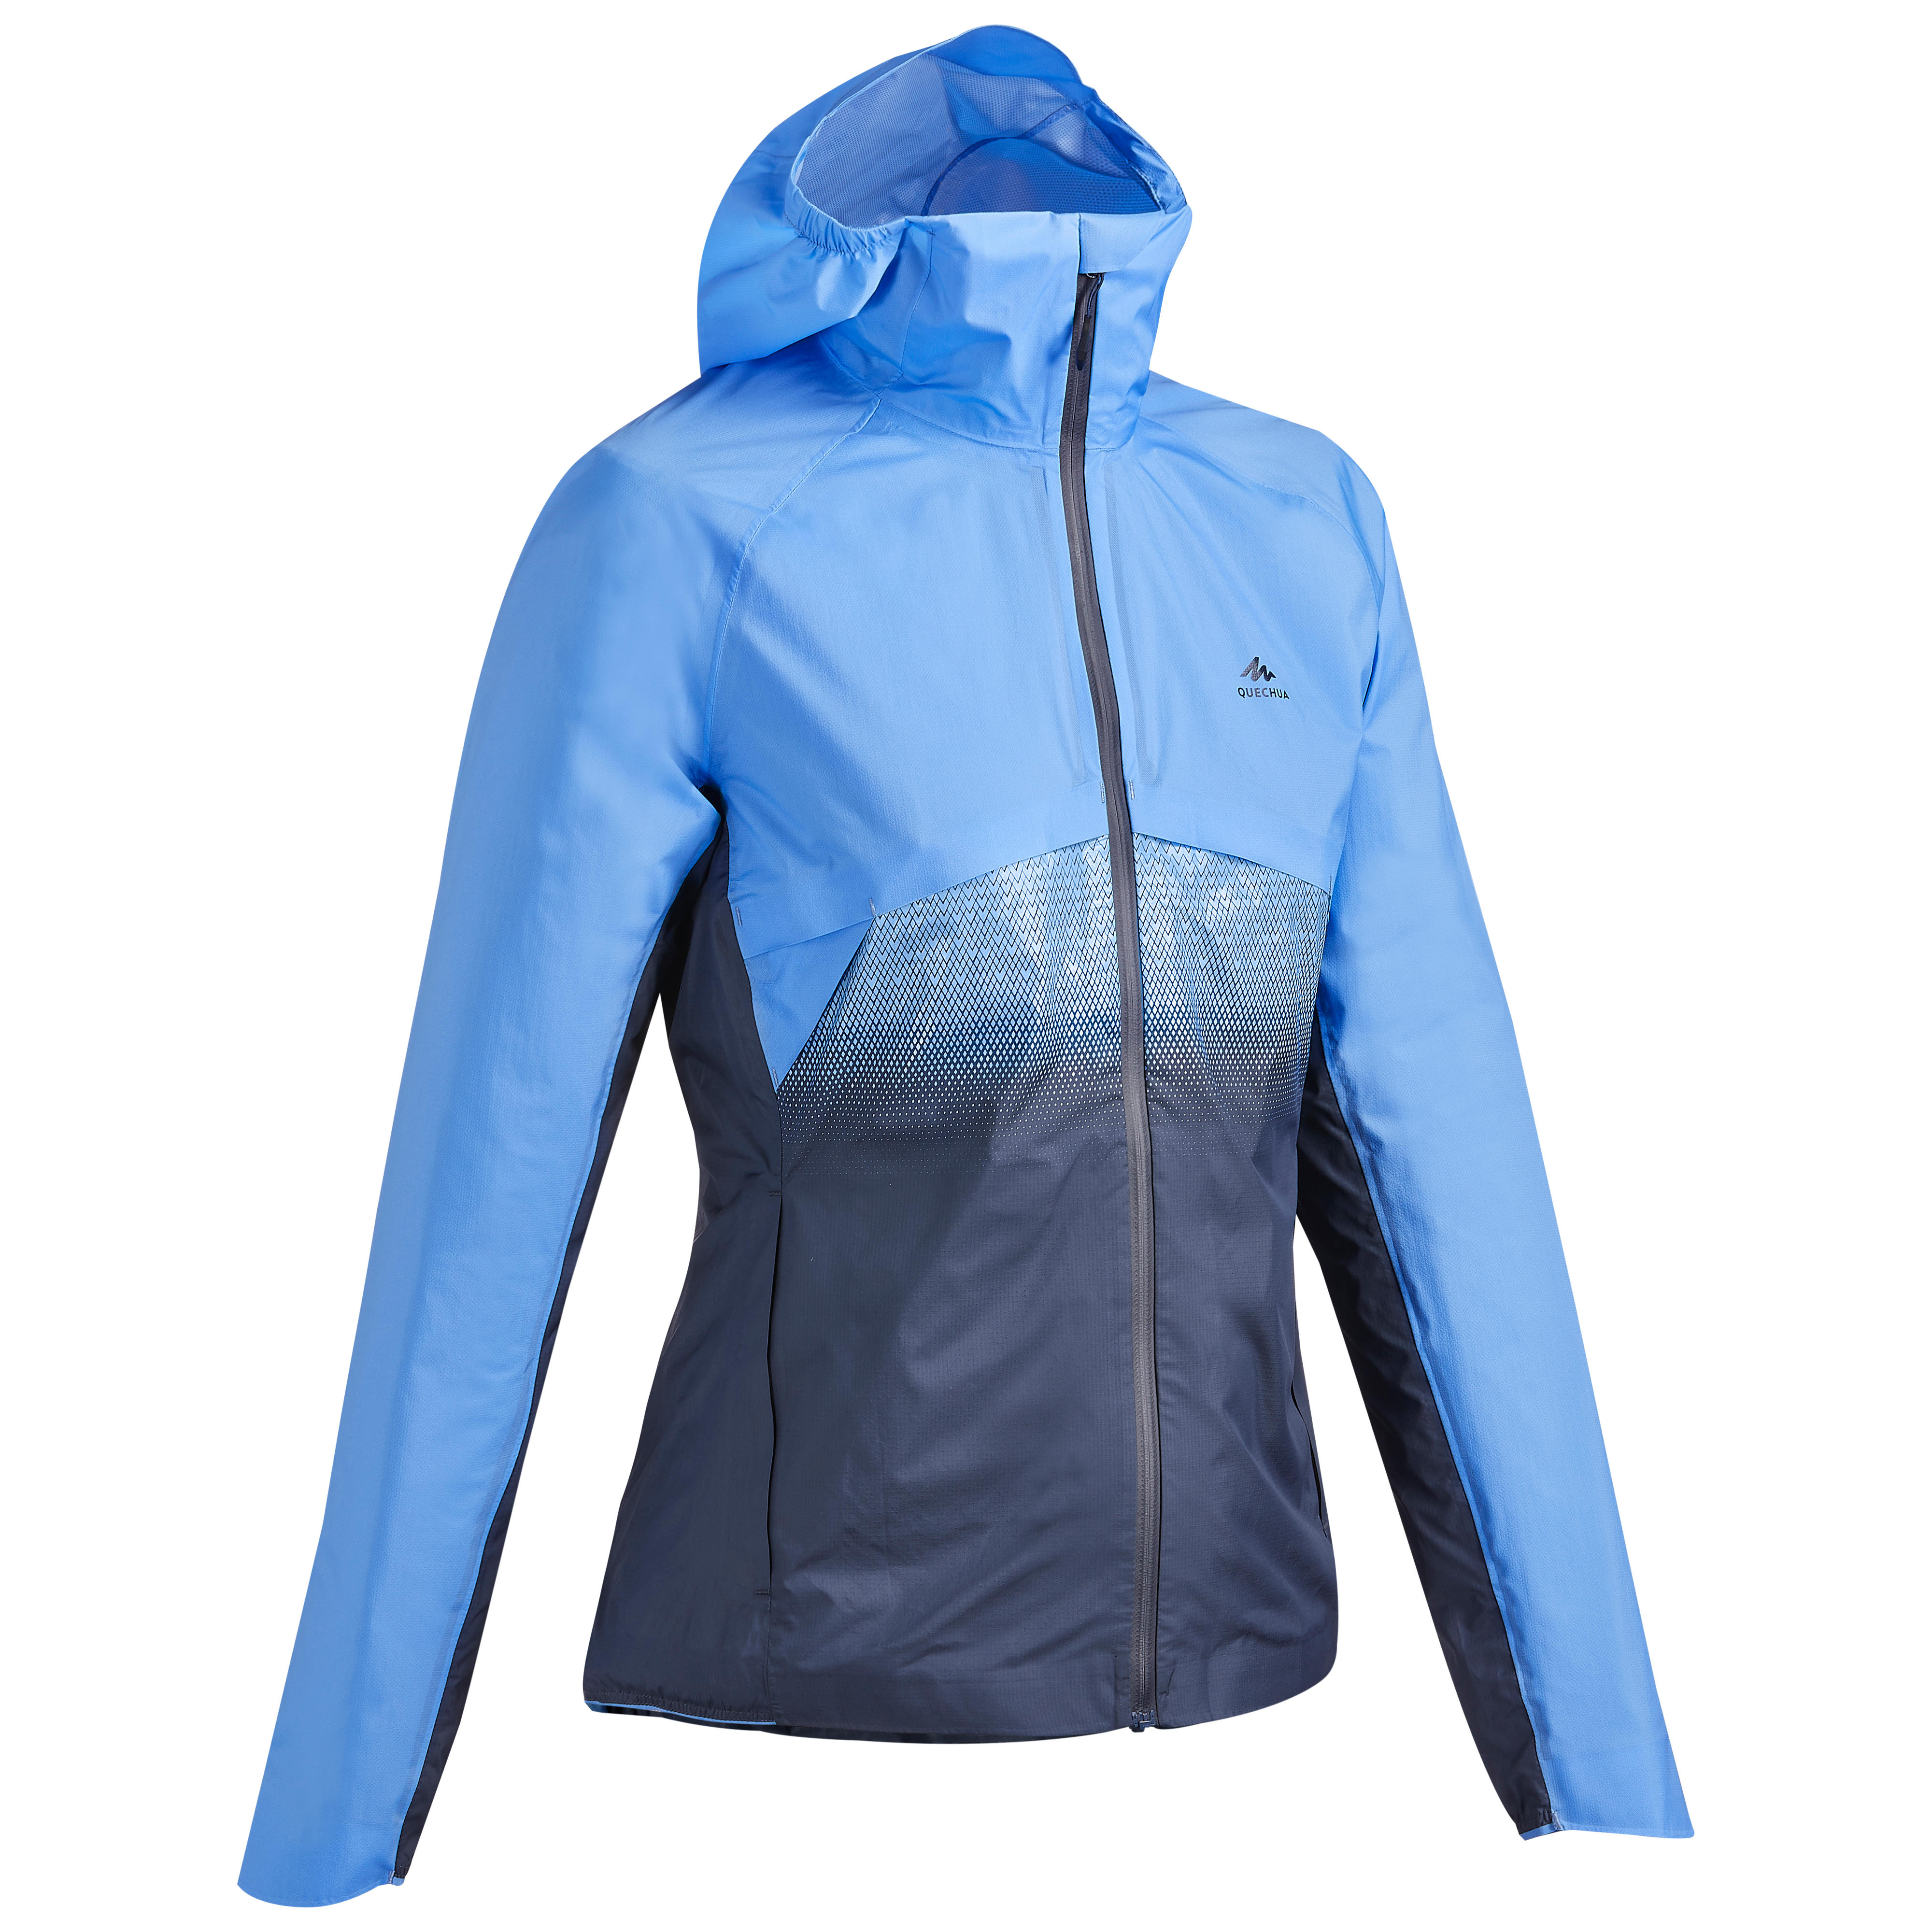 Jachetă FH 900 hybrid Damă imagine